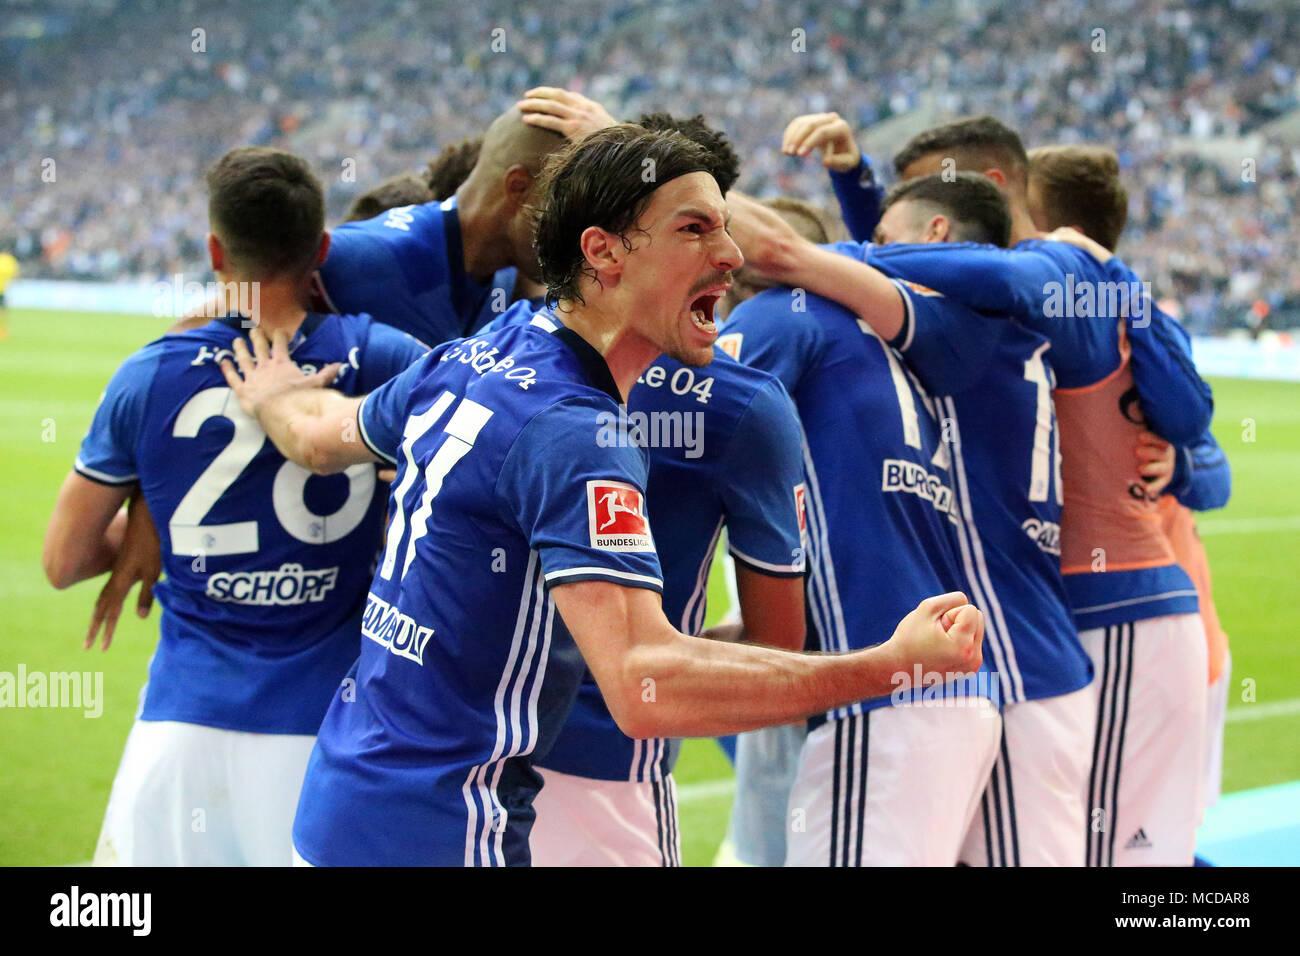 Gelsenkirchen (Germania). Xv Apr, 2018. I giocatori di FC Schalke 04 celebrare dopo rigature durante la Bundesliga match tra FC Schalke 04 e Borussia Dortmund a Gelsenkirchen, Germania, il 15 aprile 2018. Credito: Joachim Bywaletz/Xinhua/Alamy Live News Foto Stock